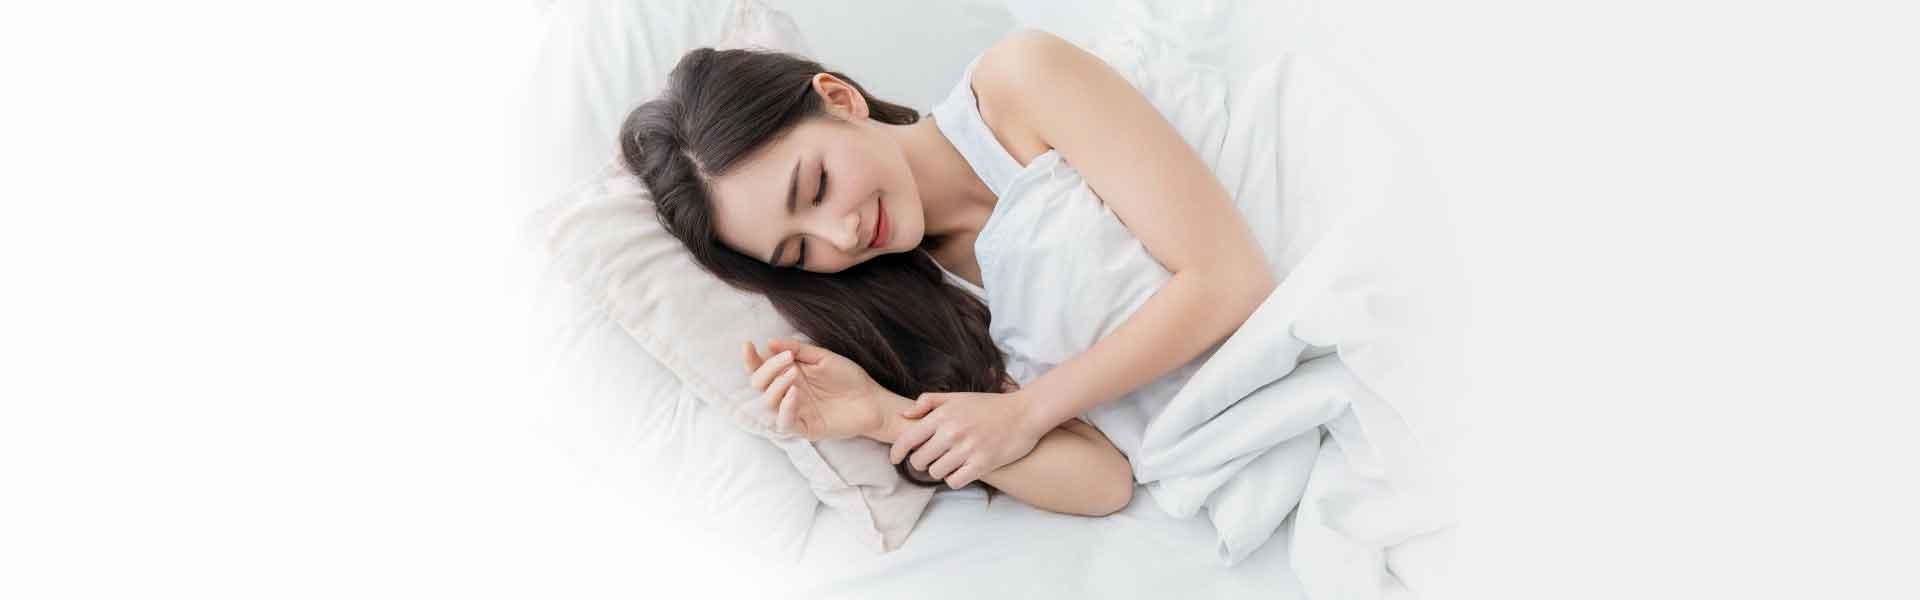 Find Help For Your Sleep Apnea Problems